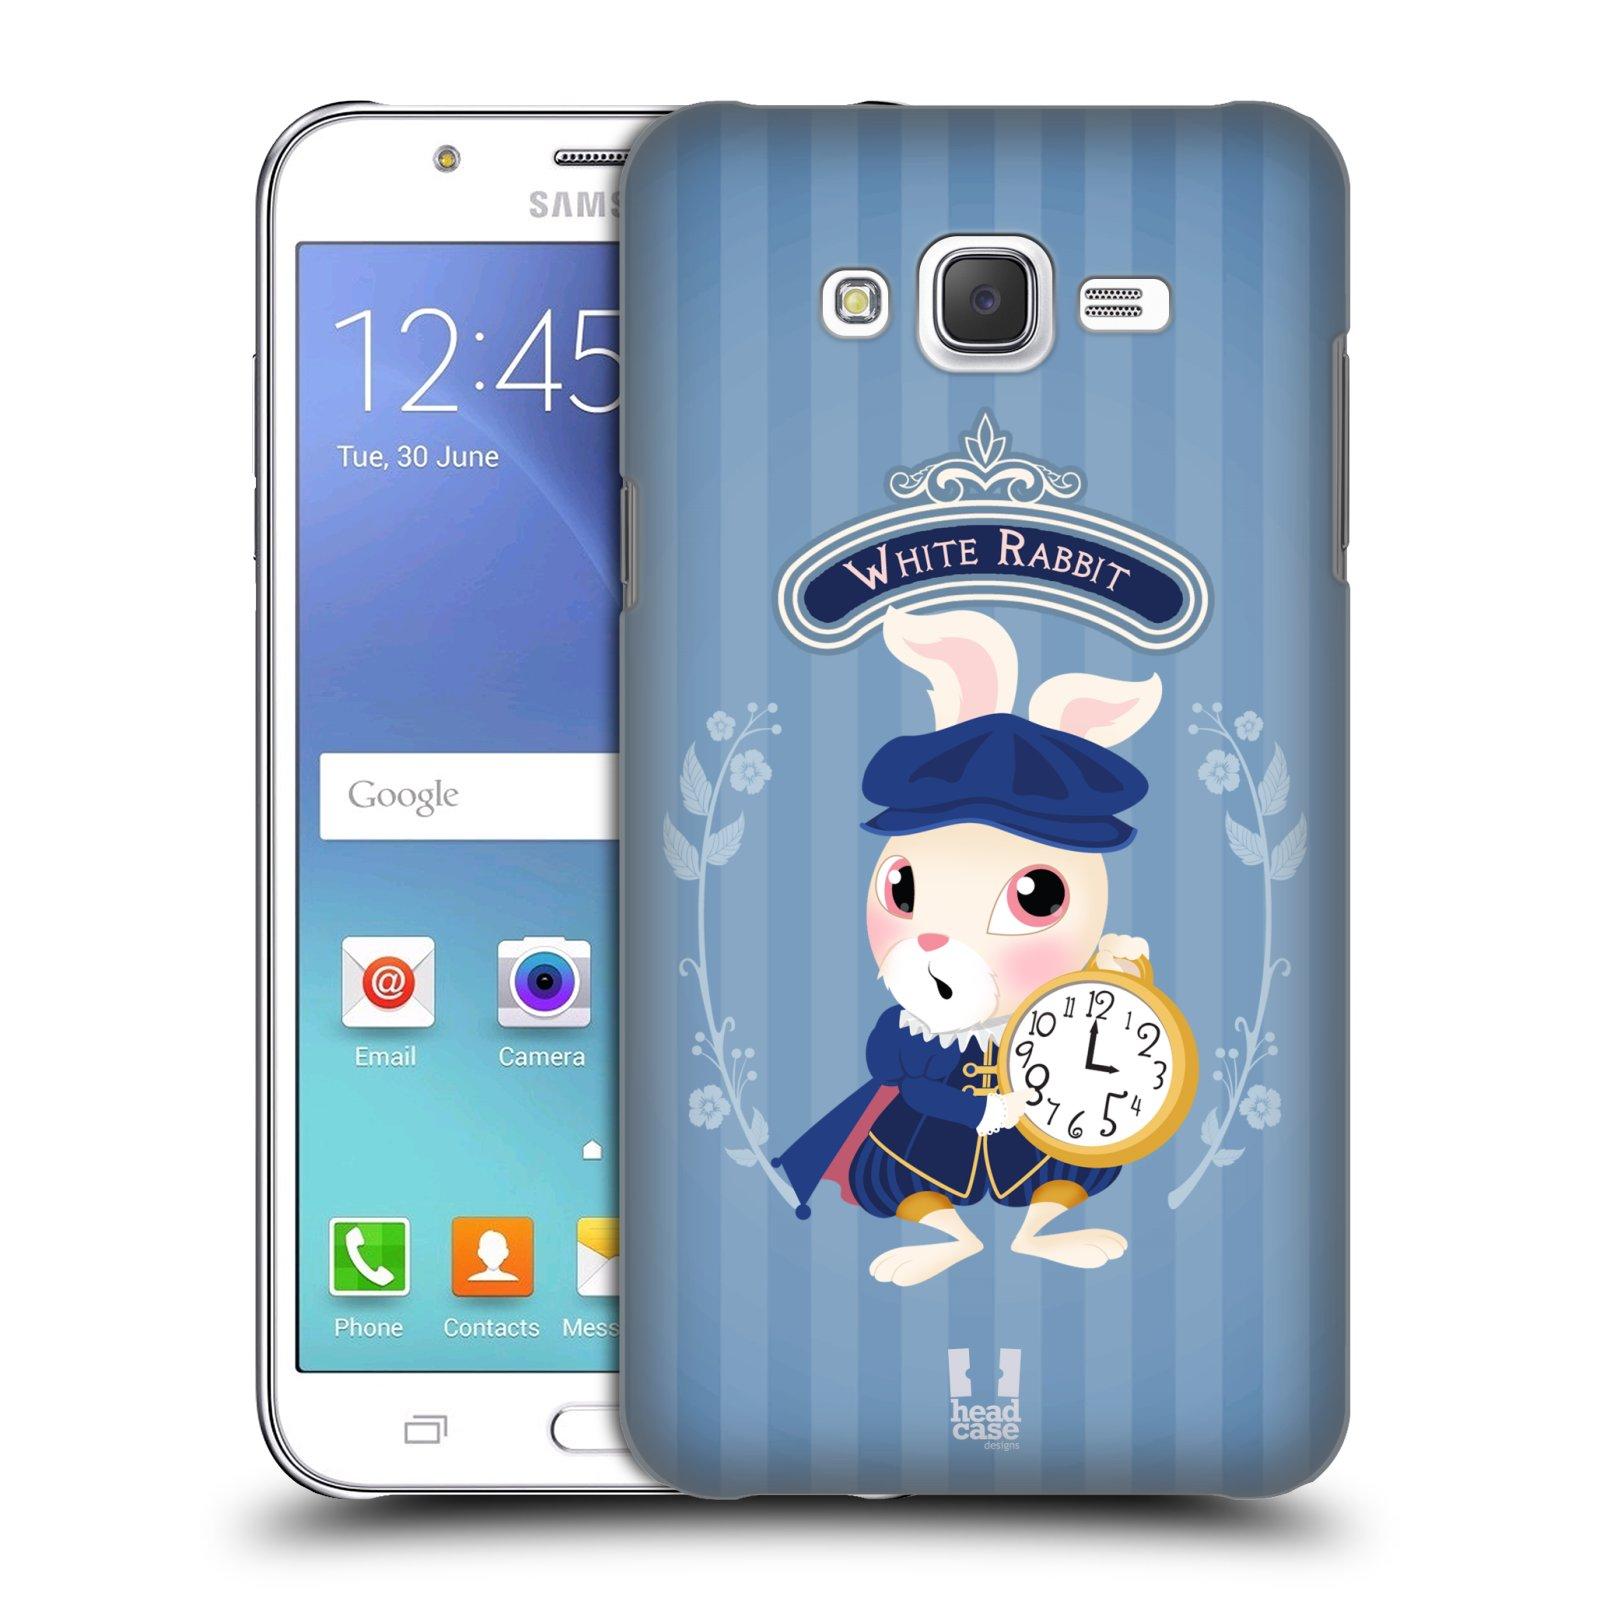 HEAD CASE plastový obal na mobil SAMSUNG Galaxy J7, J700 vzor Alenka v říši divů králíček